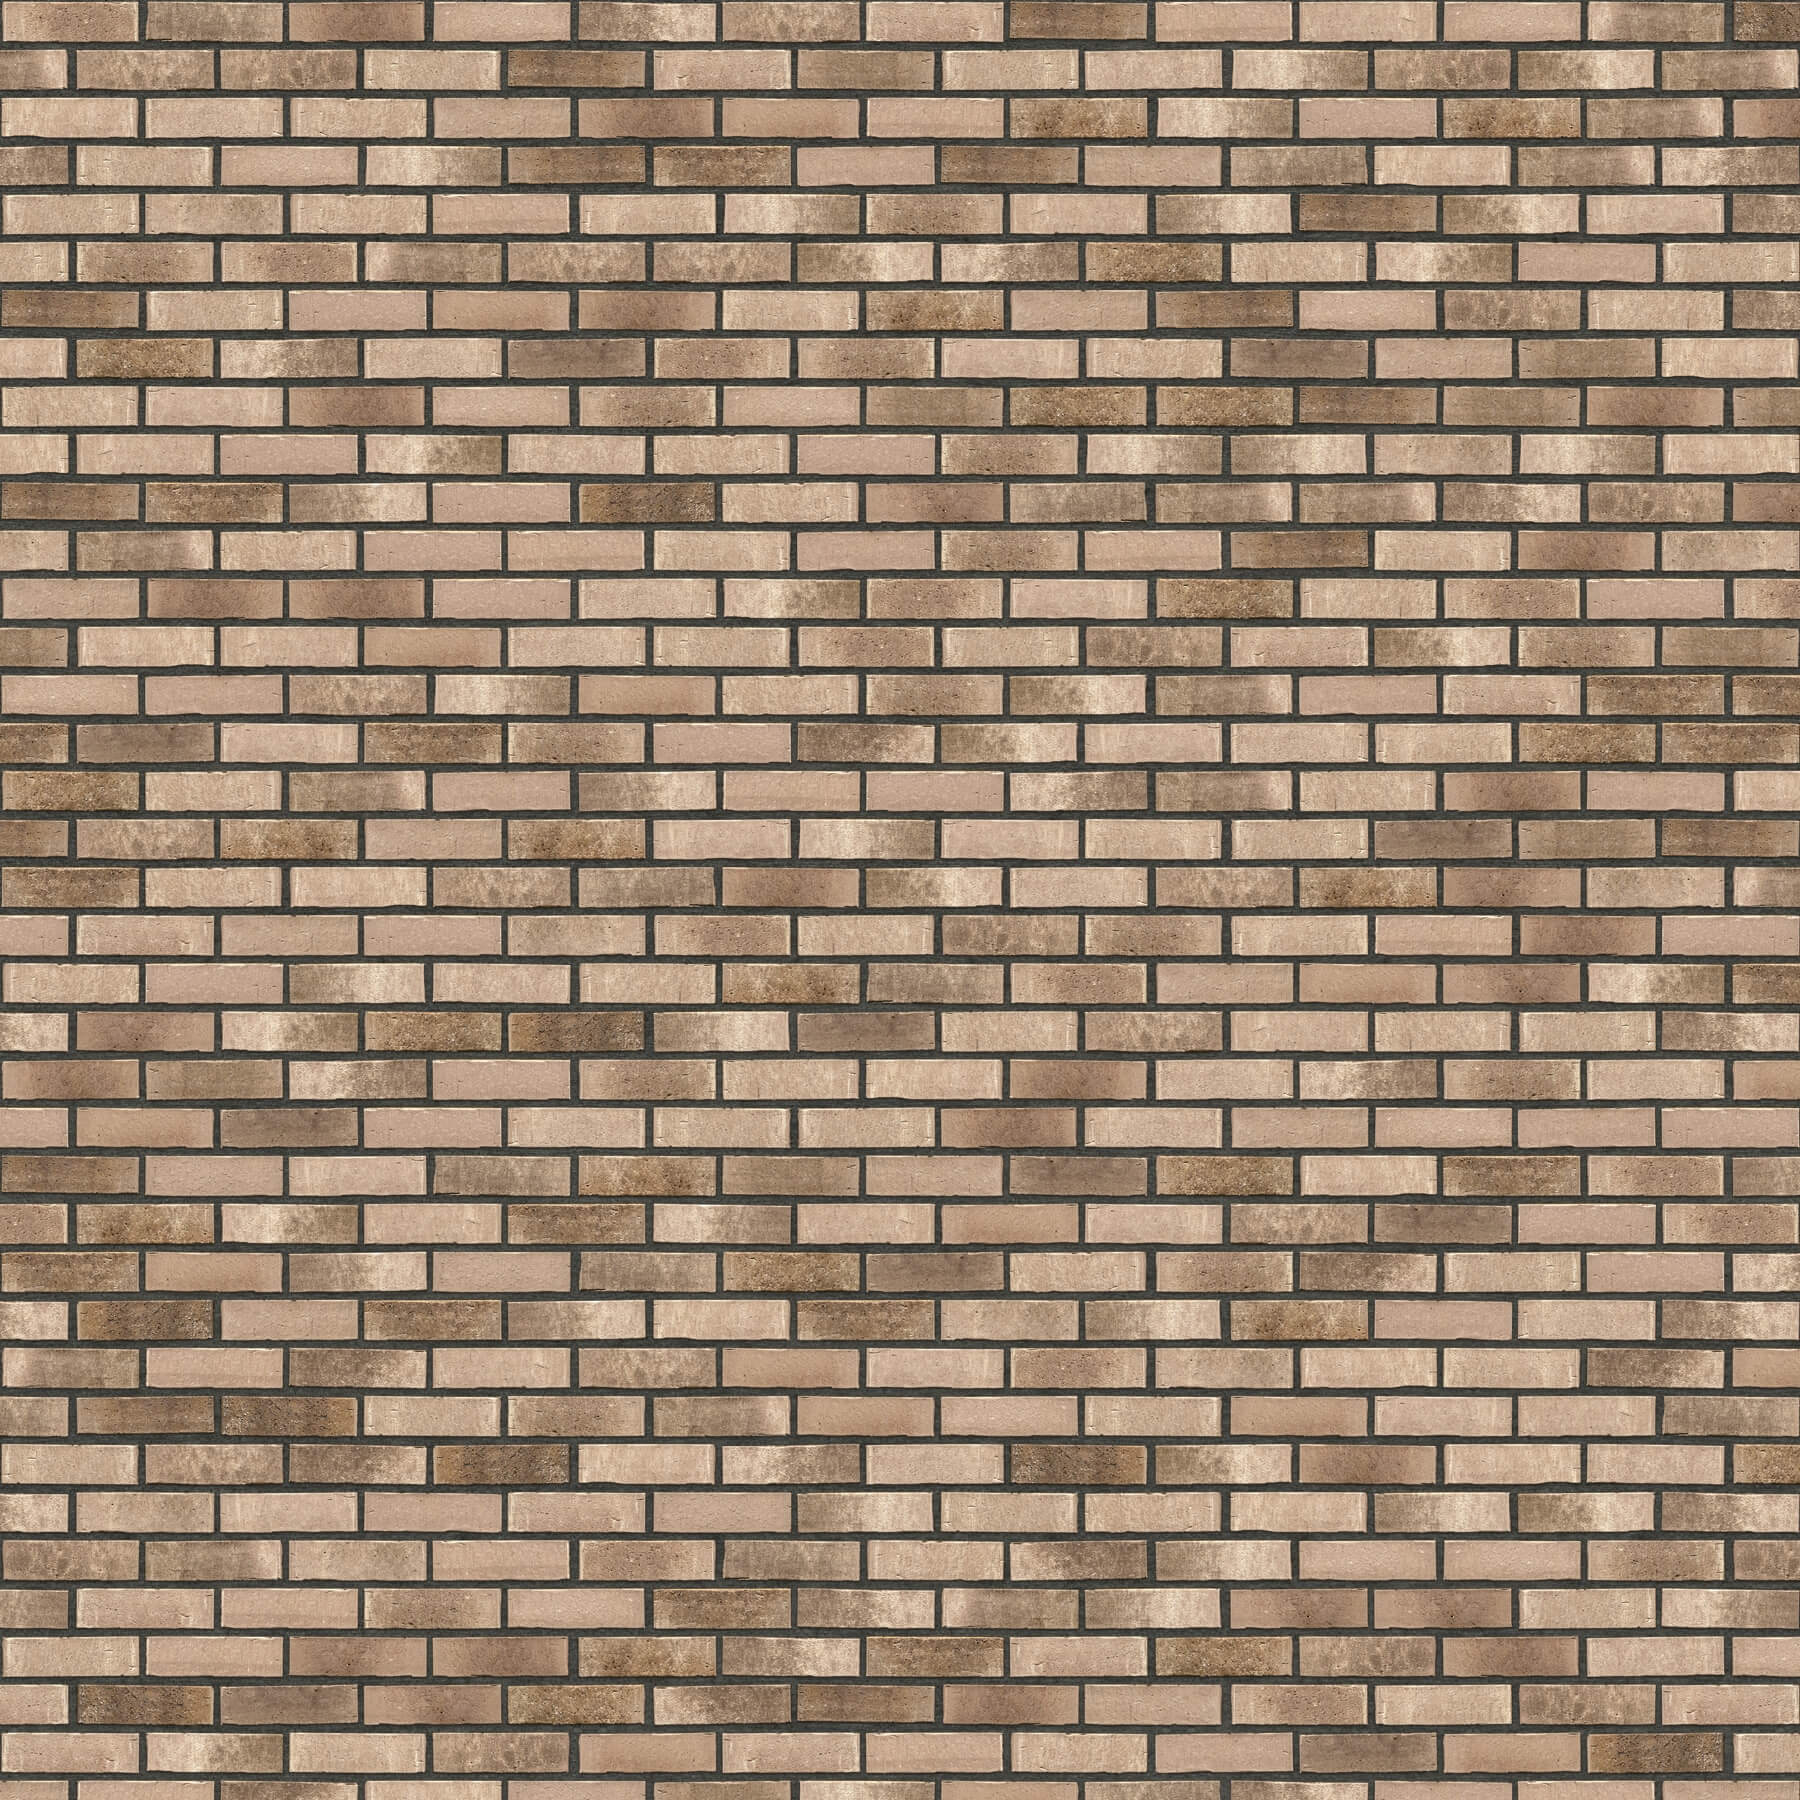 Puna-cigla-FeldHaus-Klinker-brick-house-beograd-nf-k-773-Antracit Fuga